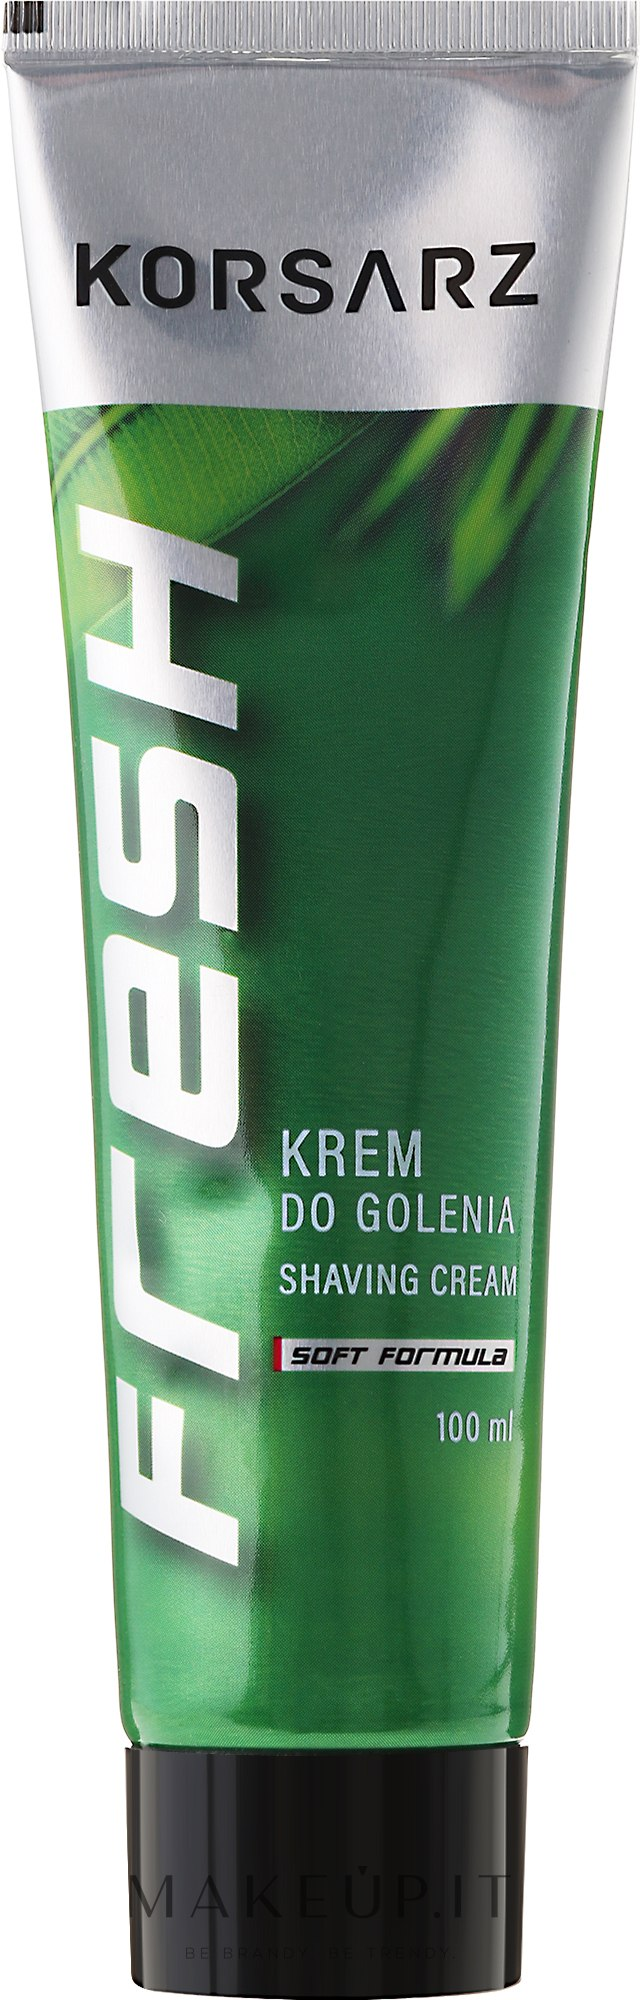 Crema da barba - Korsarz Shaving Cream — foto 100 ml